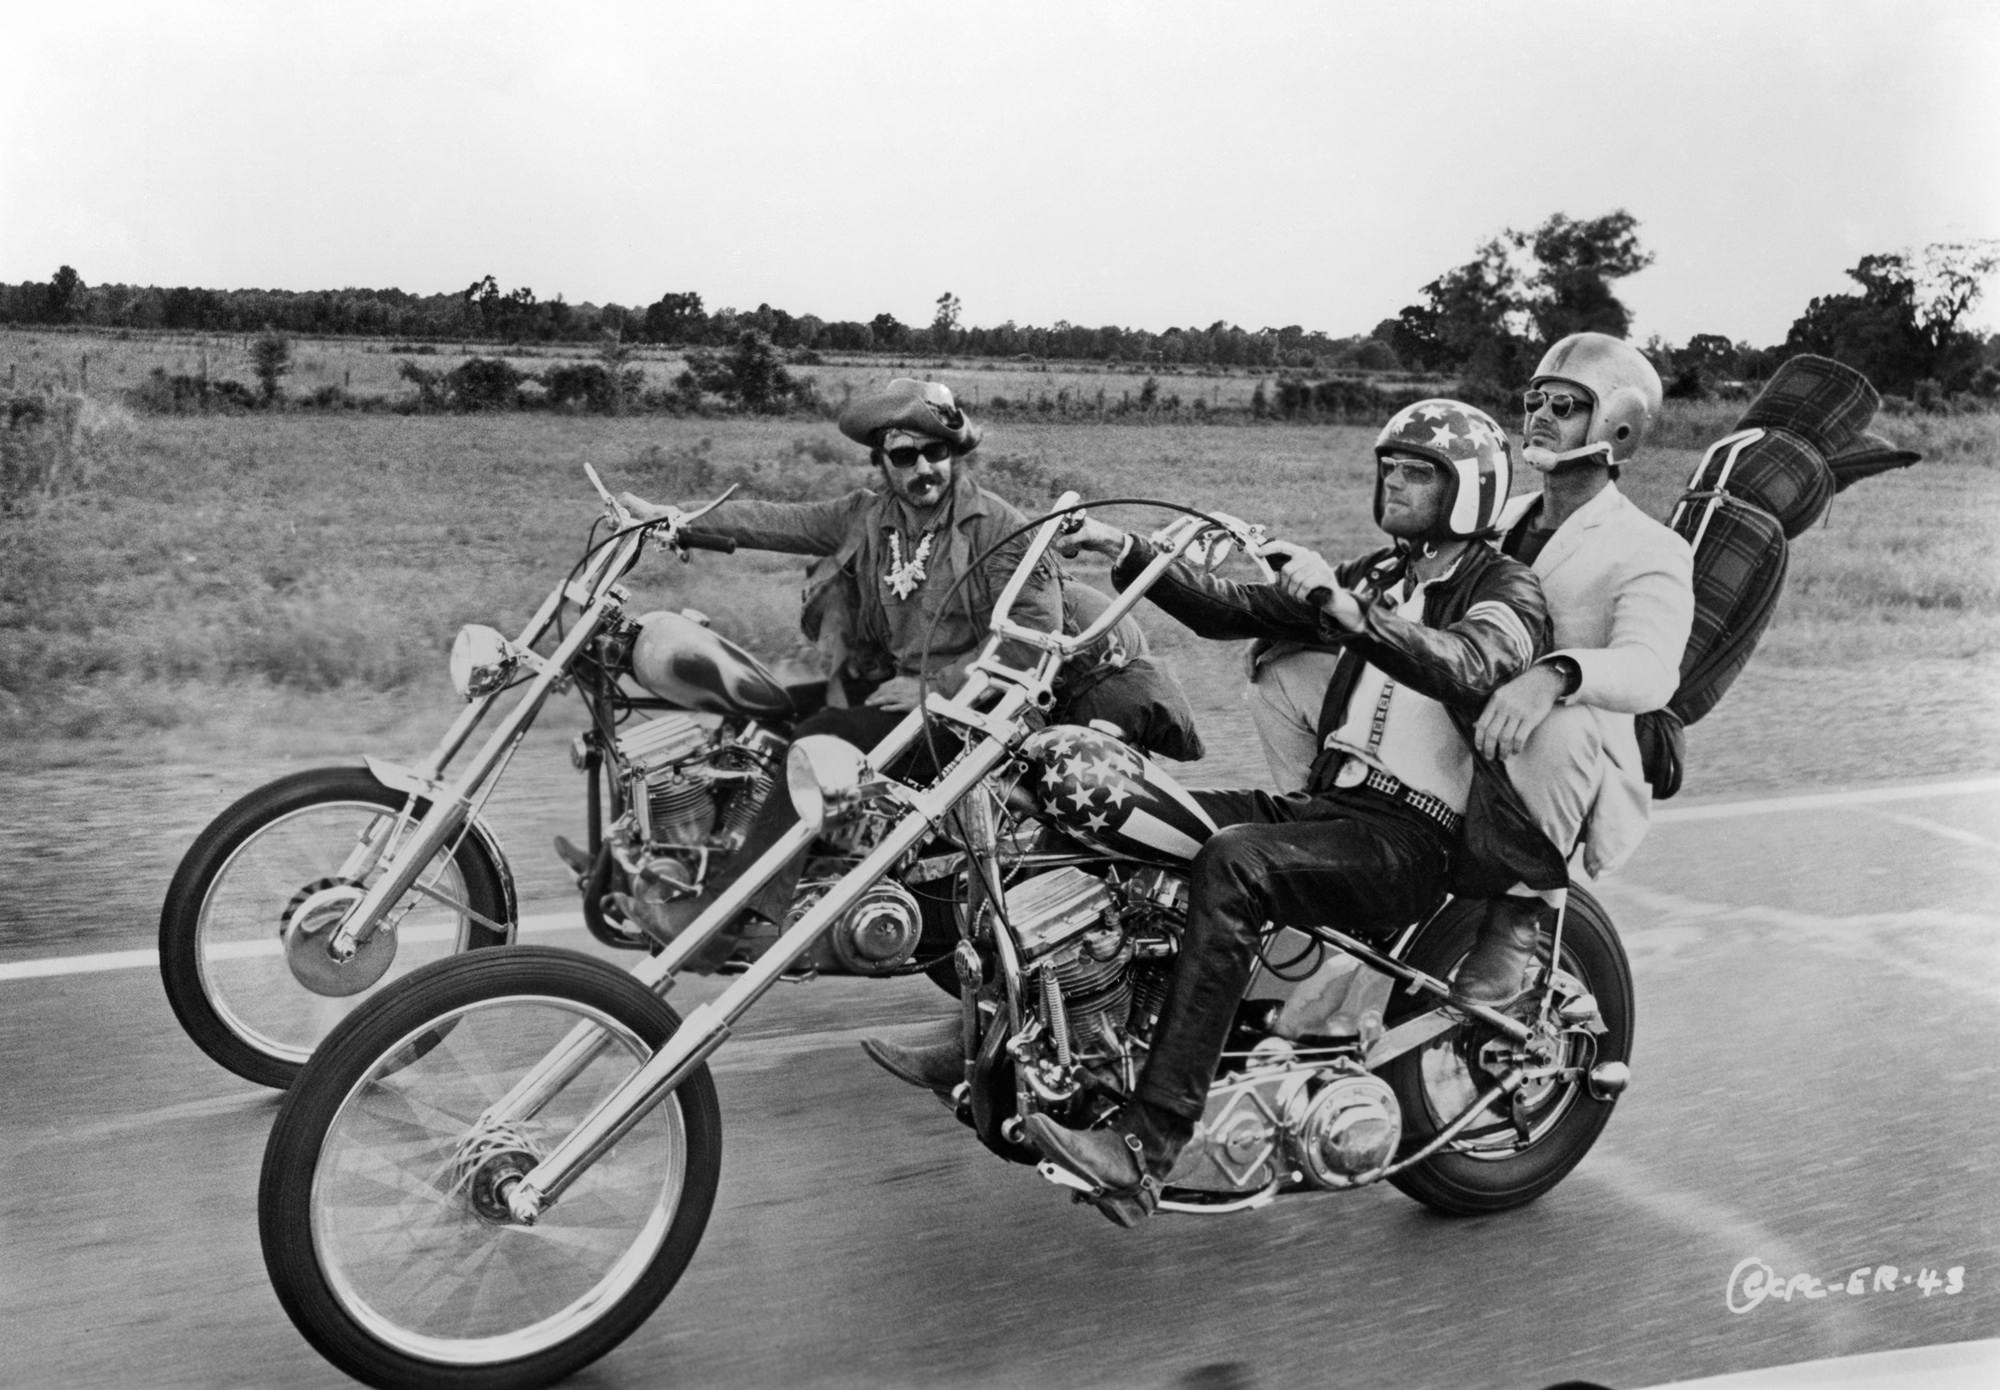 Dennis Hopper, Peter Fonda and Jack Nicholson in EASY RIDER